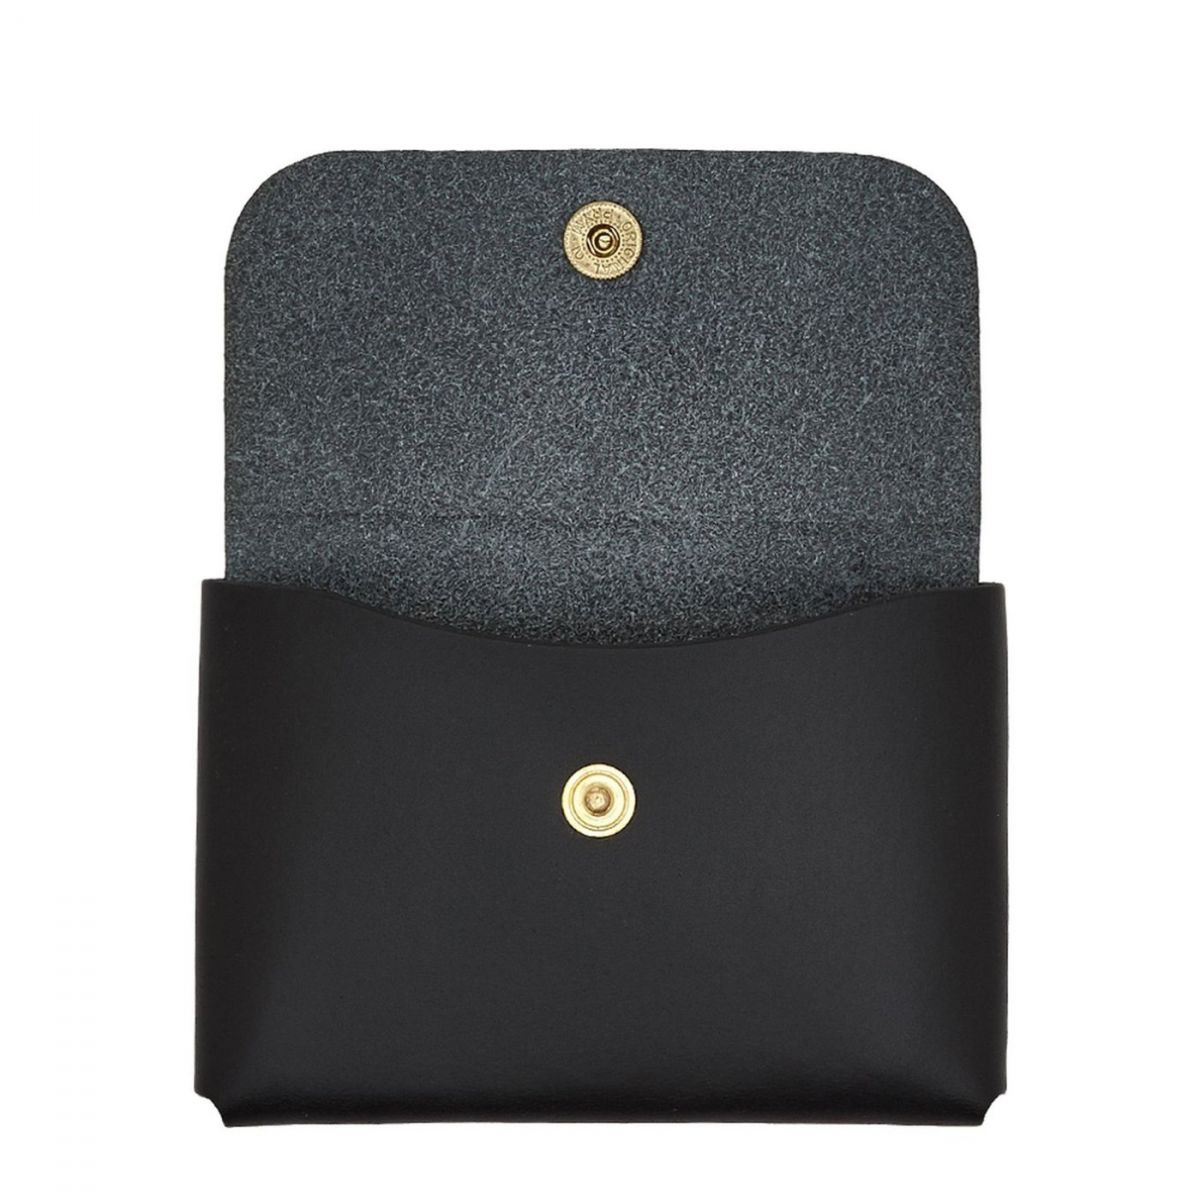 Card Case  in Cowhide Double Leather SCC032 color Black | Details